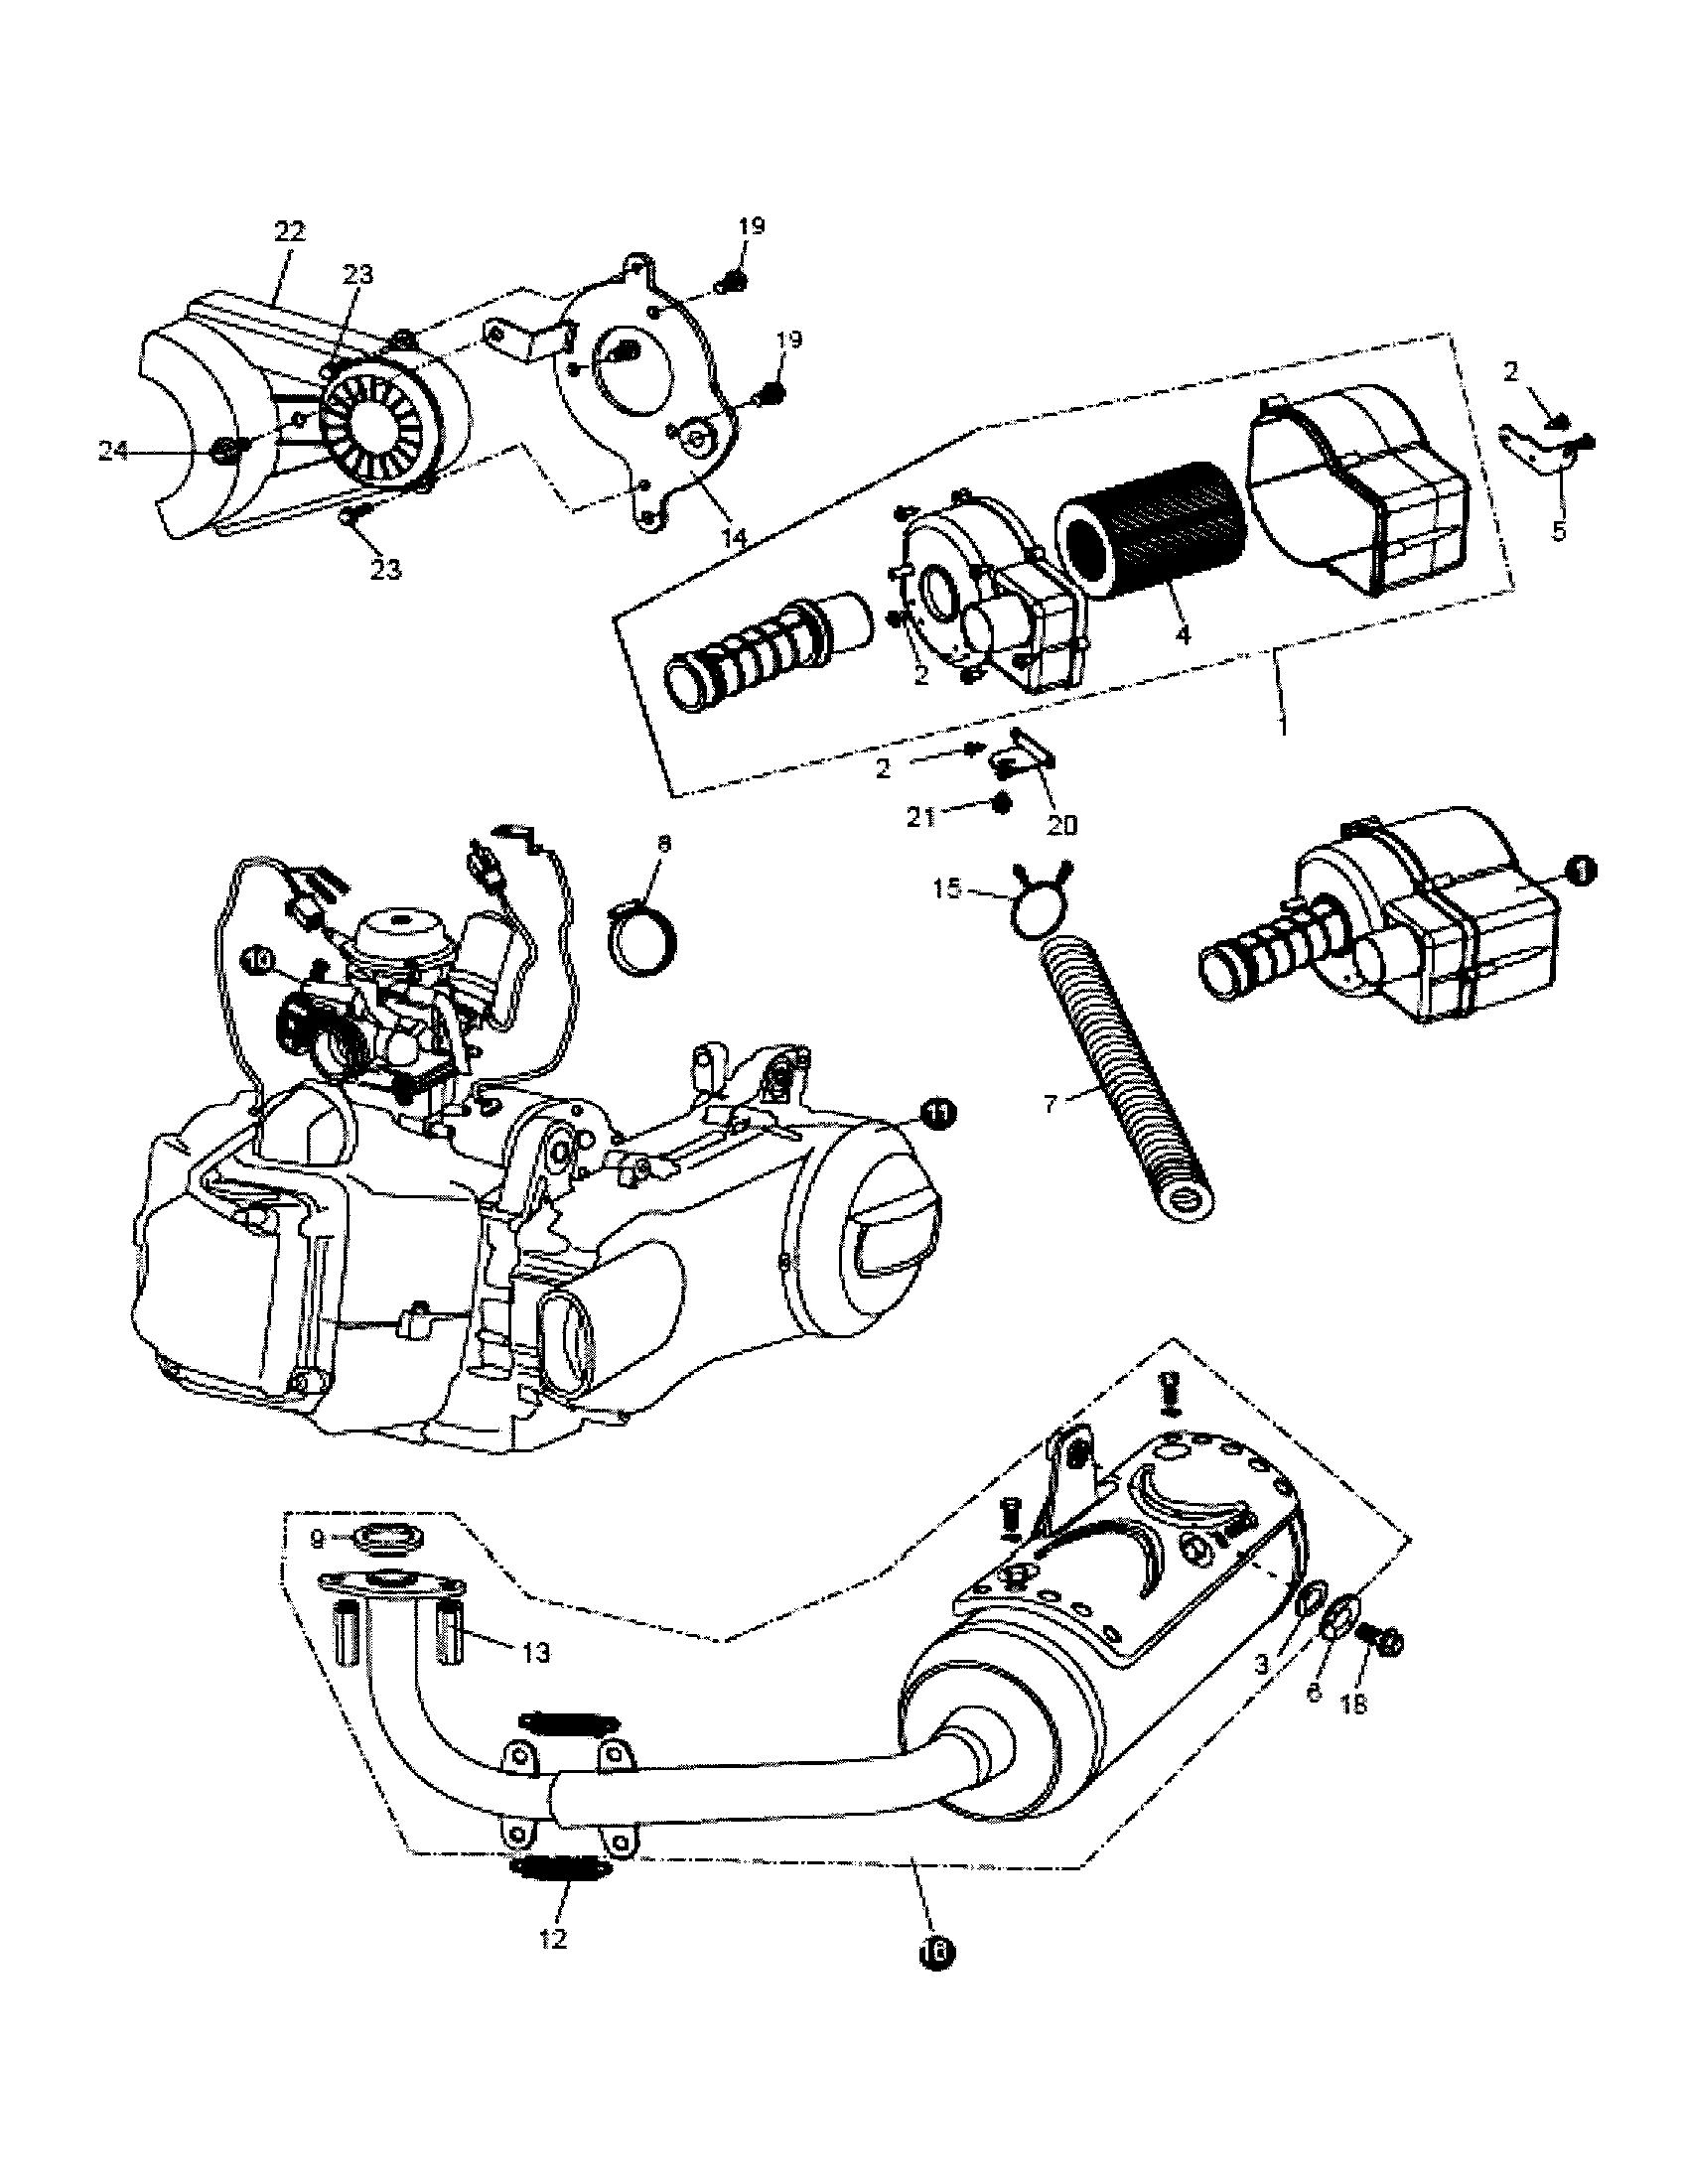 American Sportworks Wiring Diagram Bulldog 700